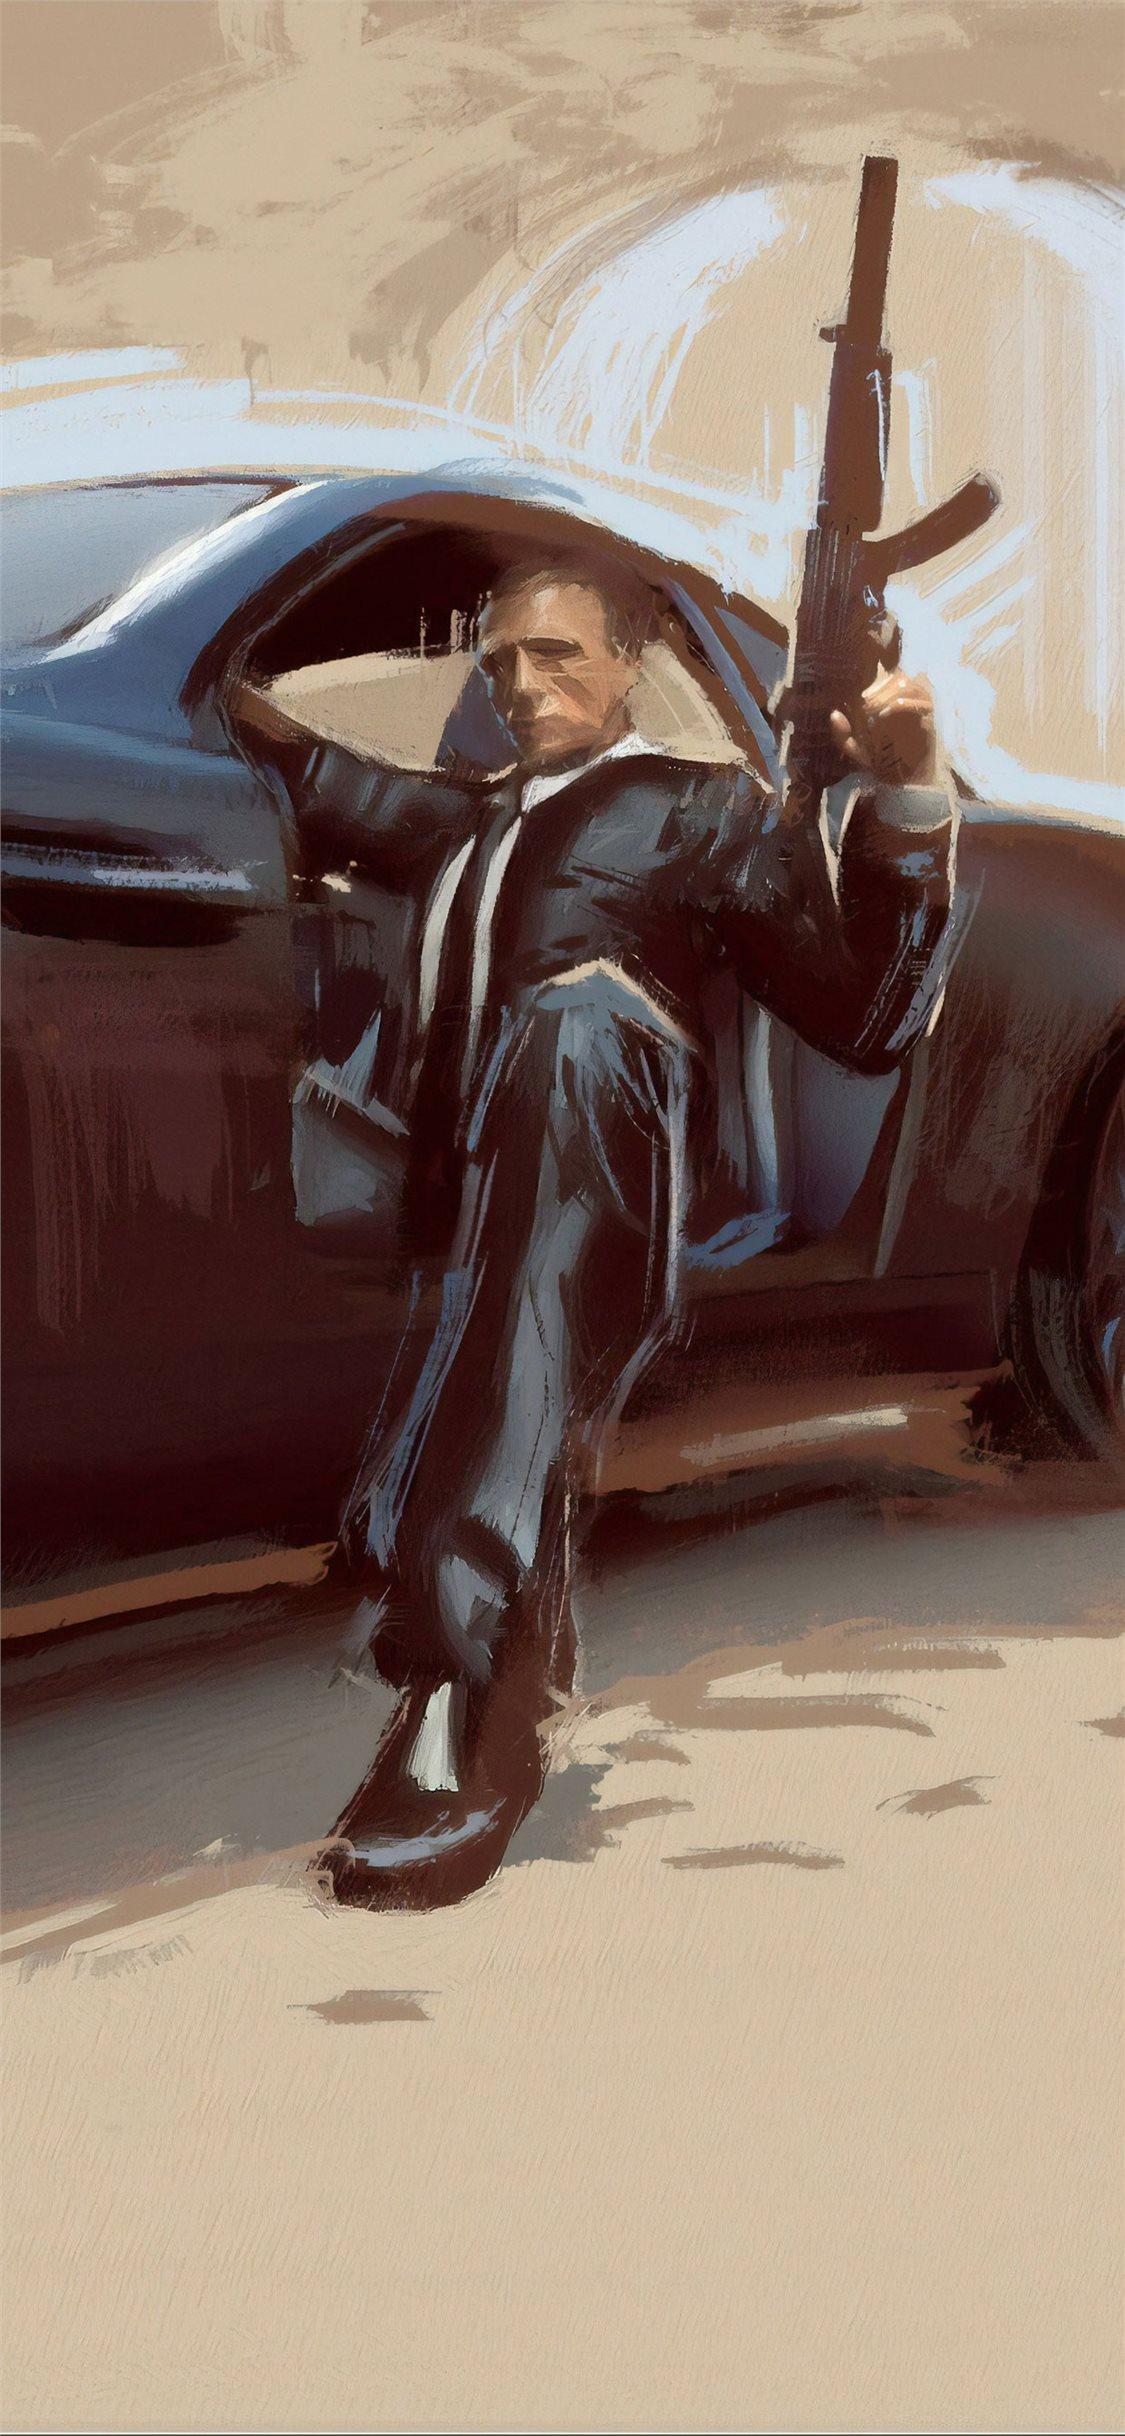 James Bond Car Art Iphone X Wallpapers Free Download